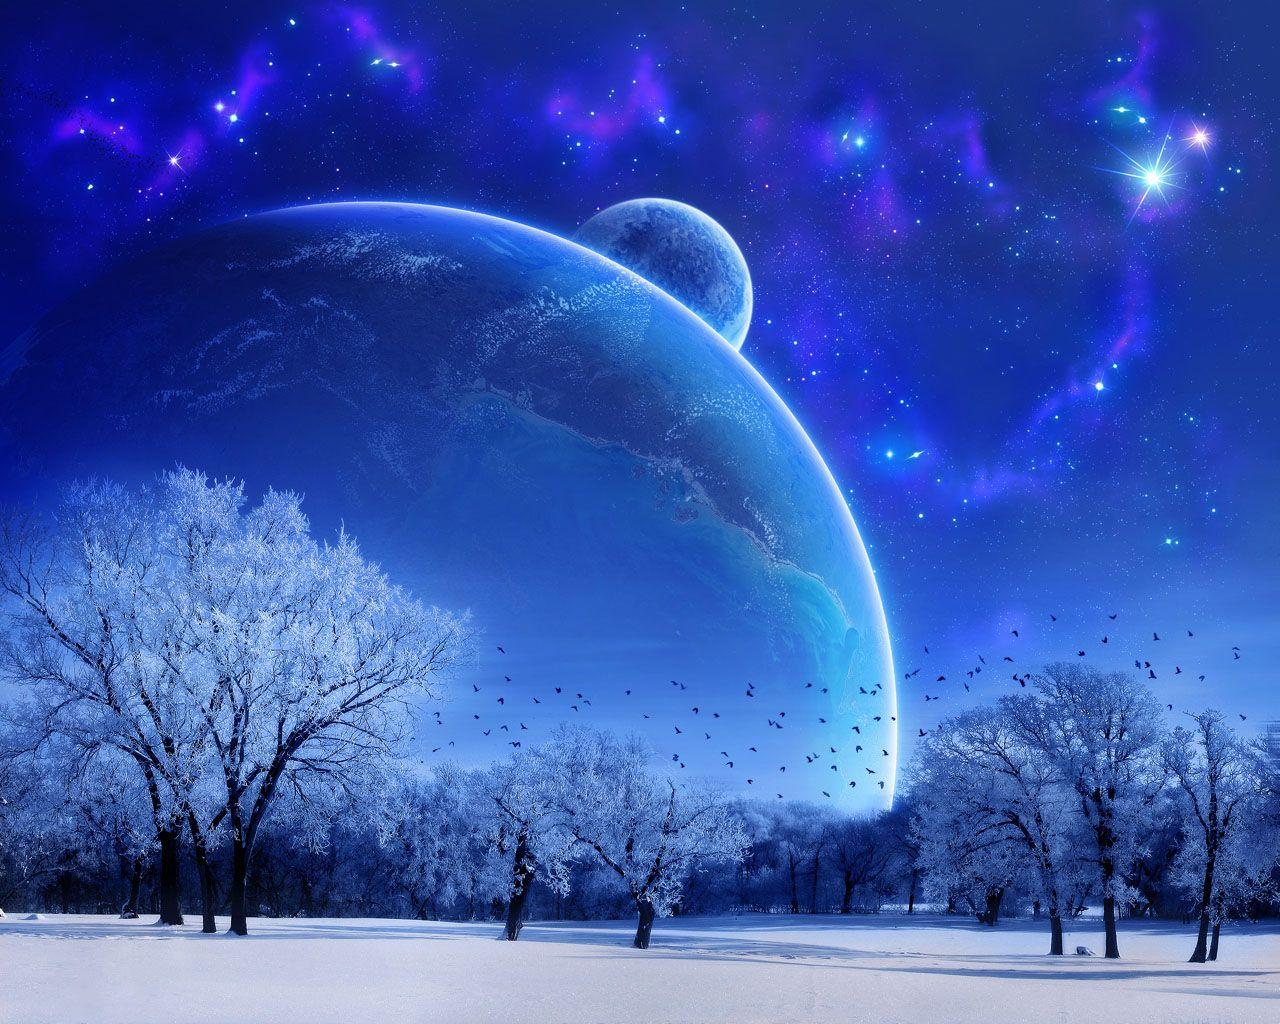 blue winter | blue winter bliss live wallpaper | wallpixy | cw